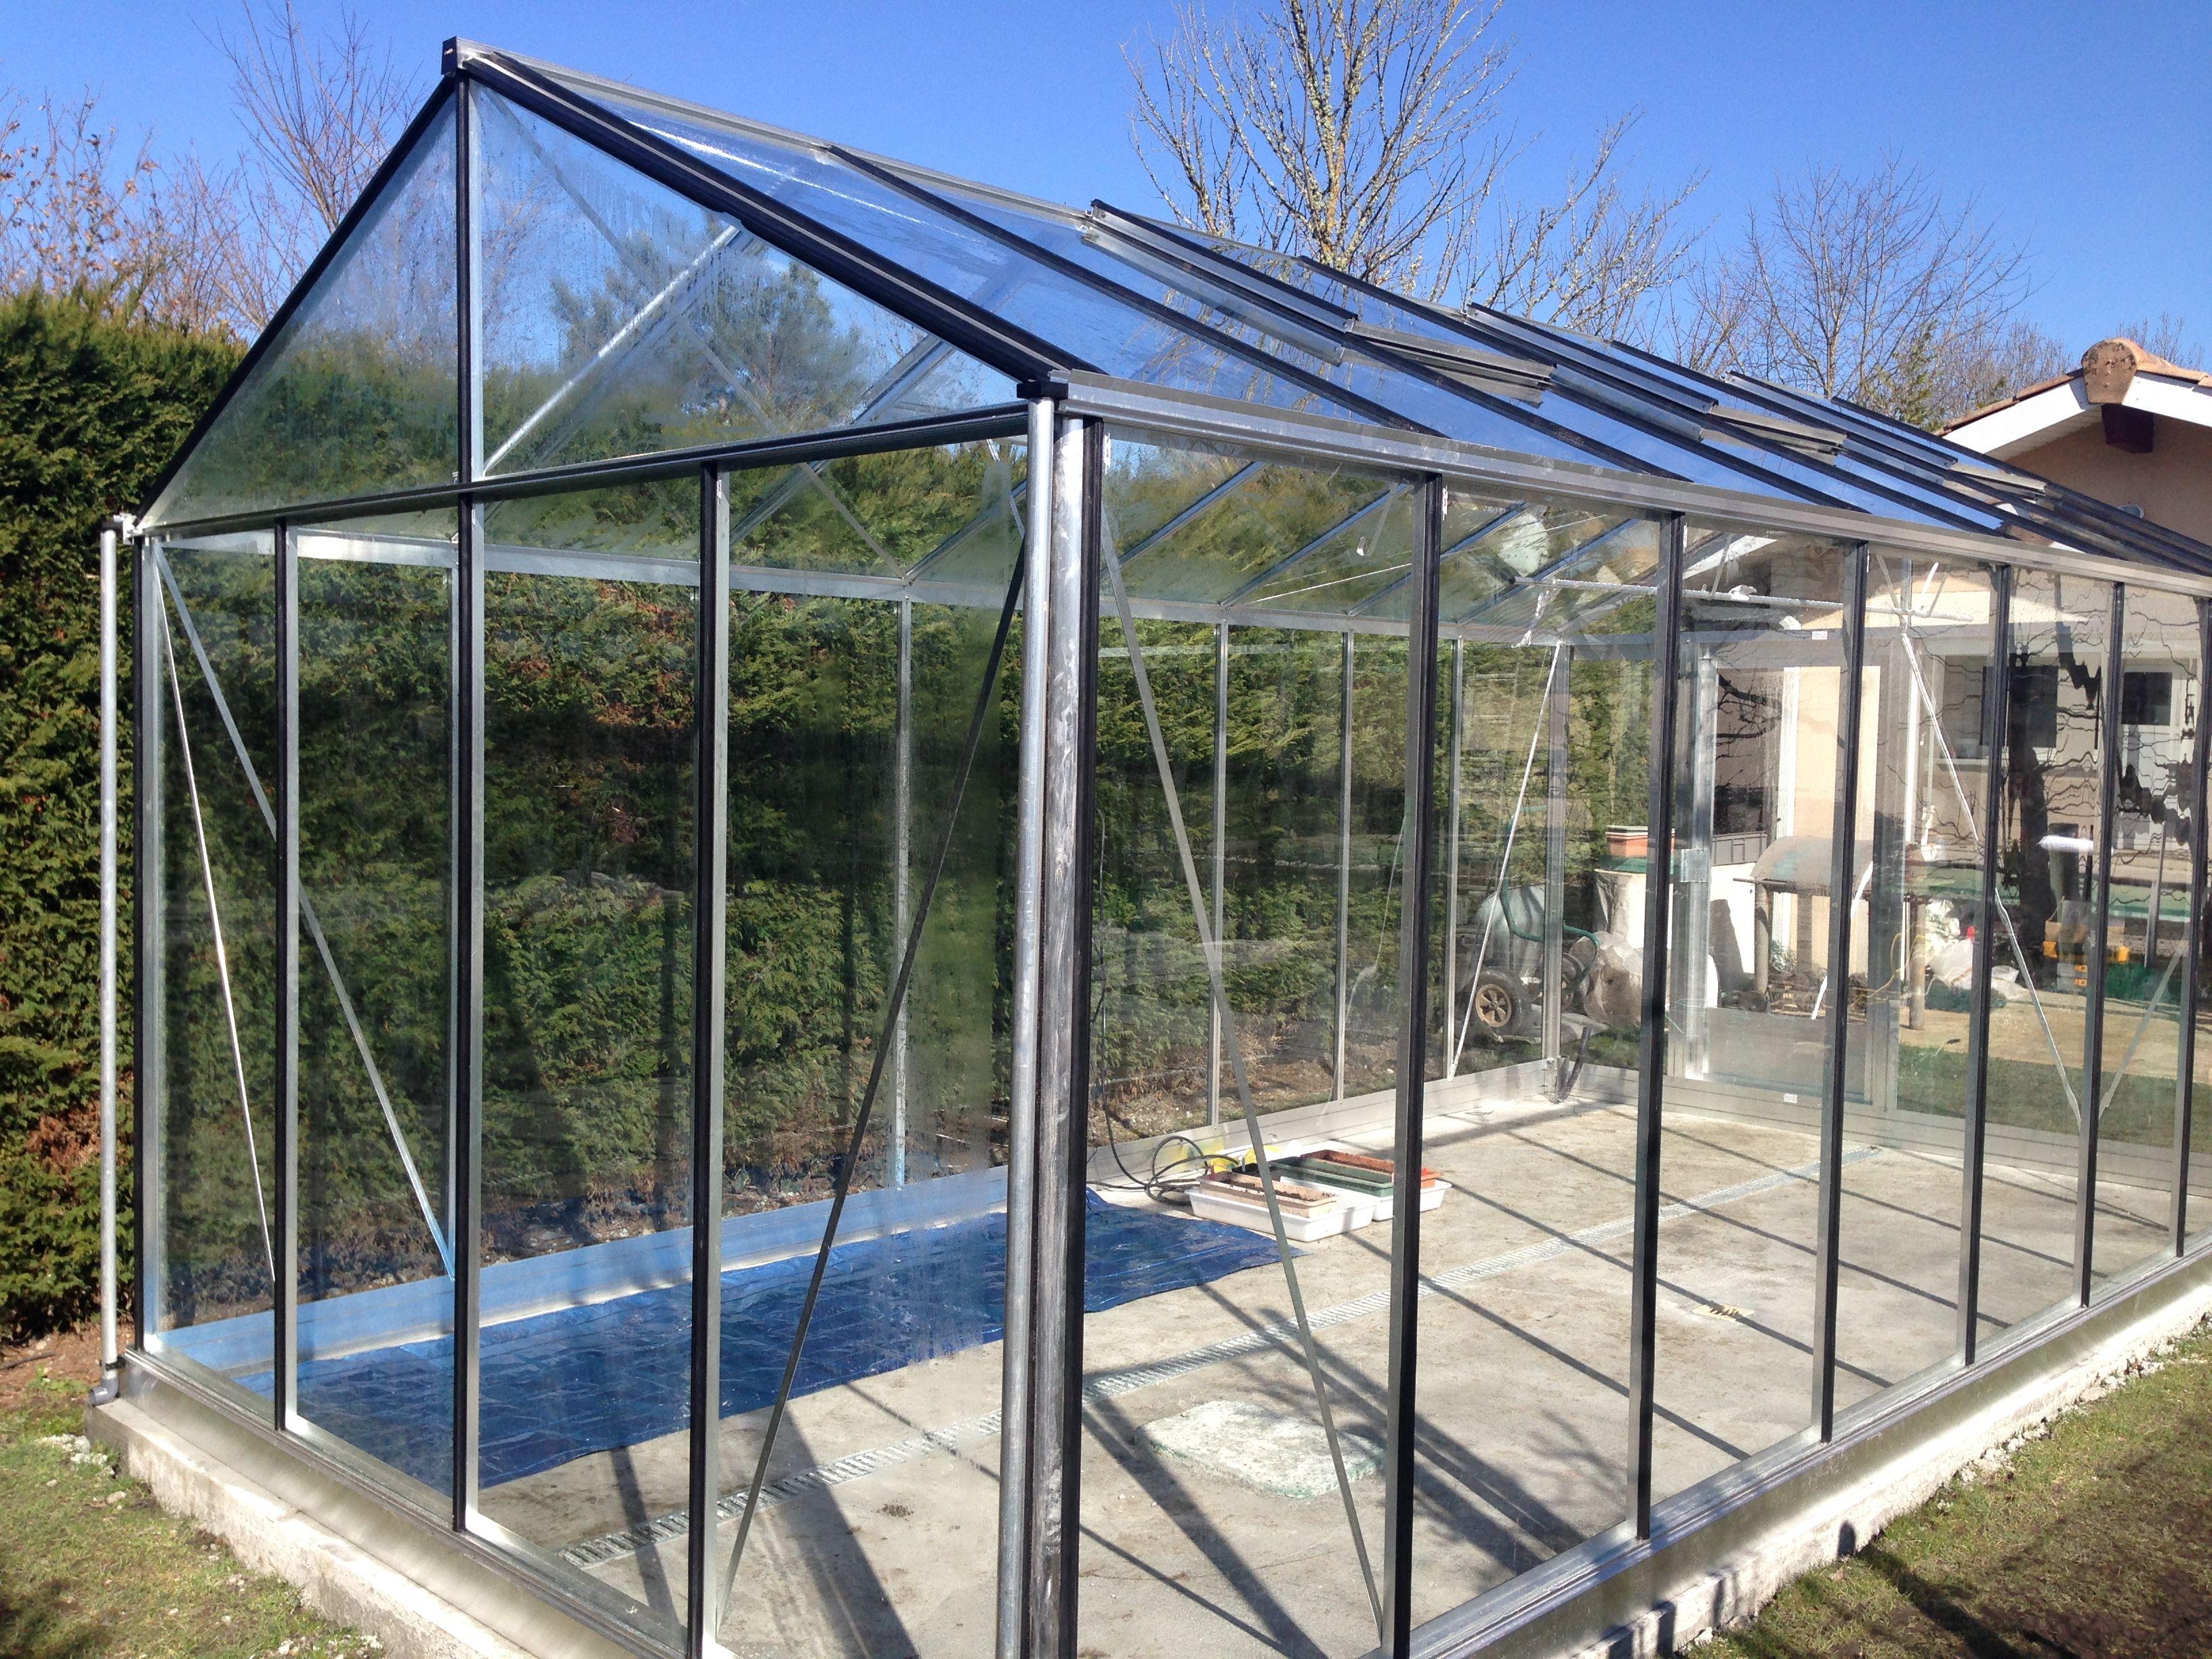 serre euro maxi largeur m serres aluminium verre polycarbonate pinterest. Black Bedroom Furniture Sets. Home Design Ideas